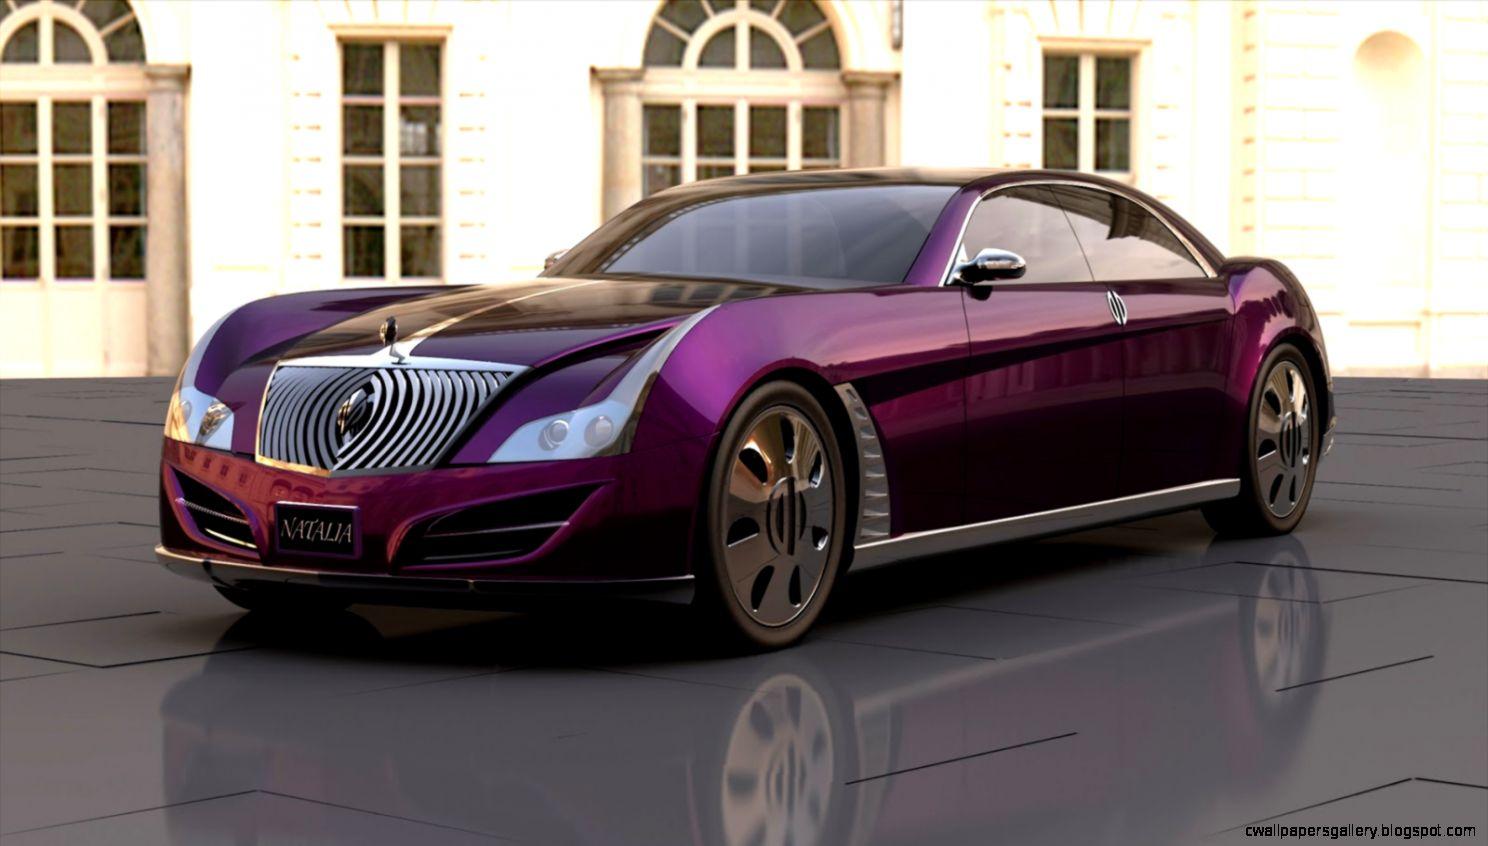 Luxury Life Design 2 Million Luxury Car Concept   DiMora Natalia